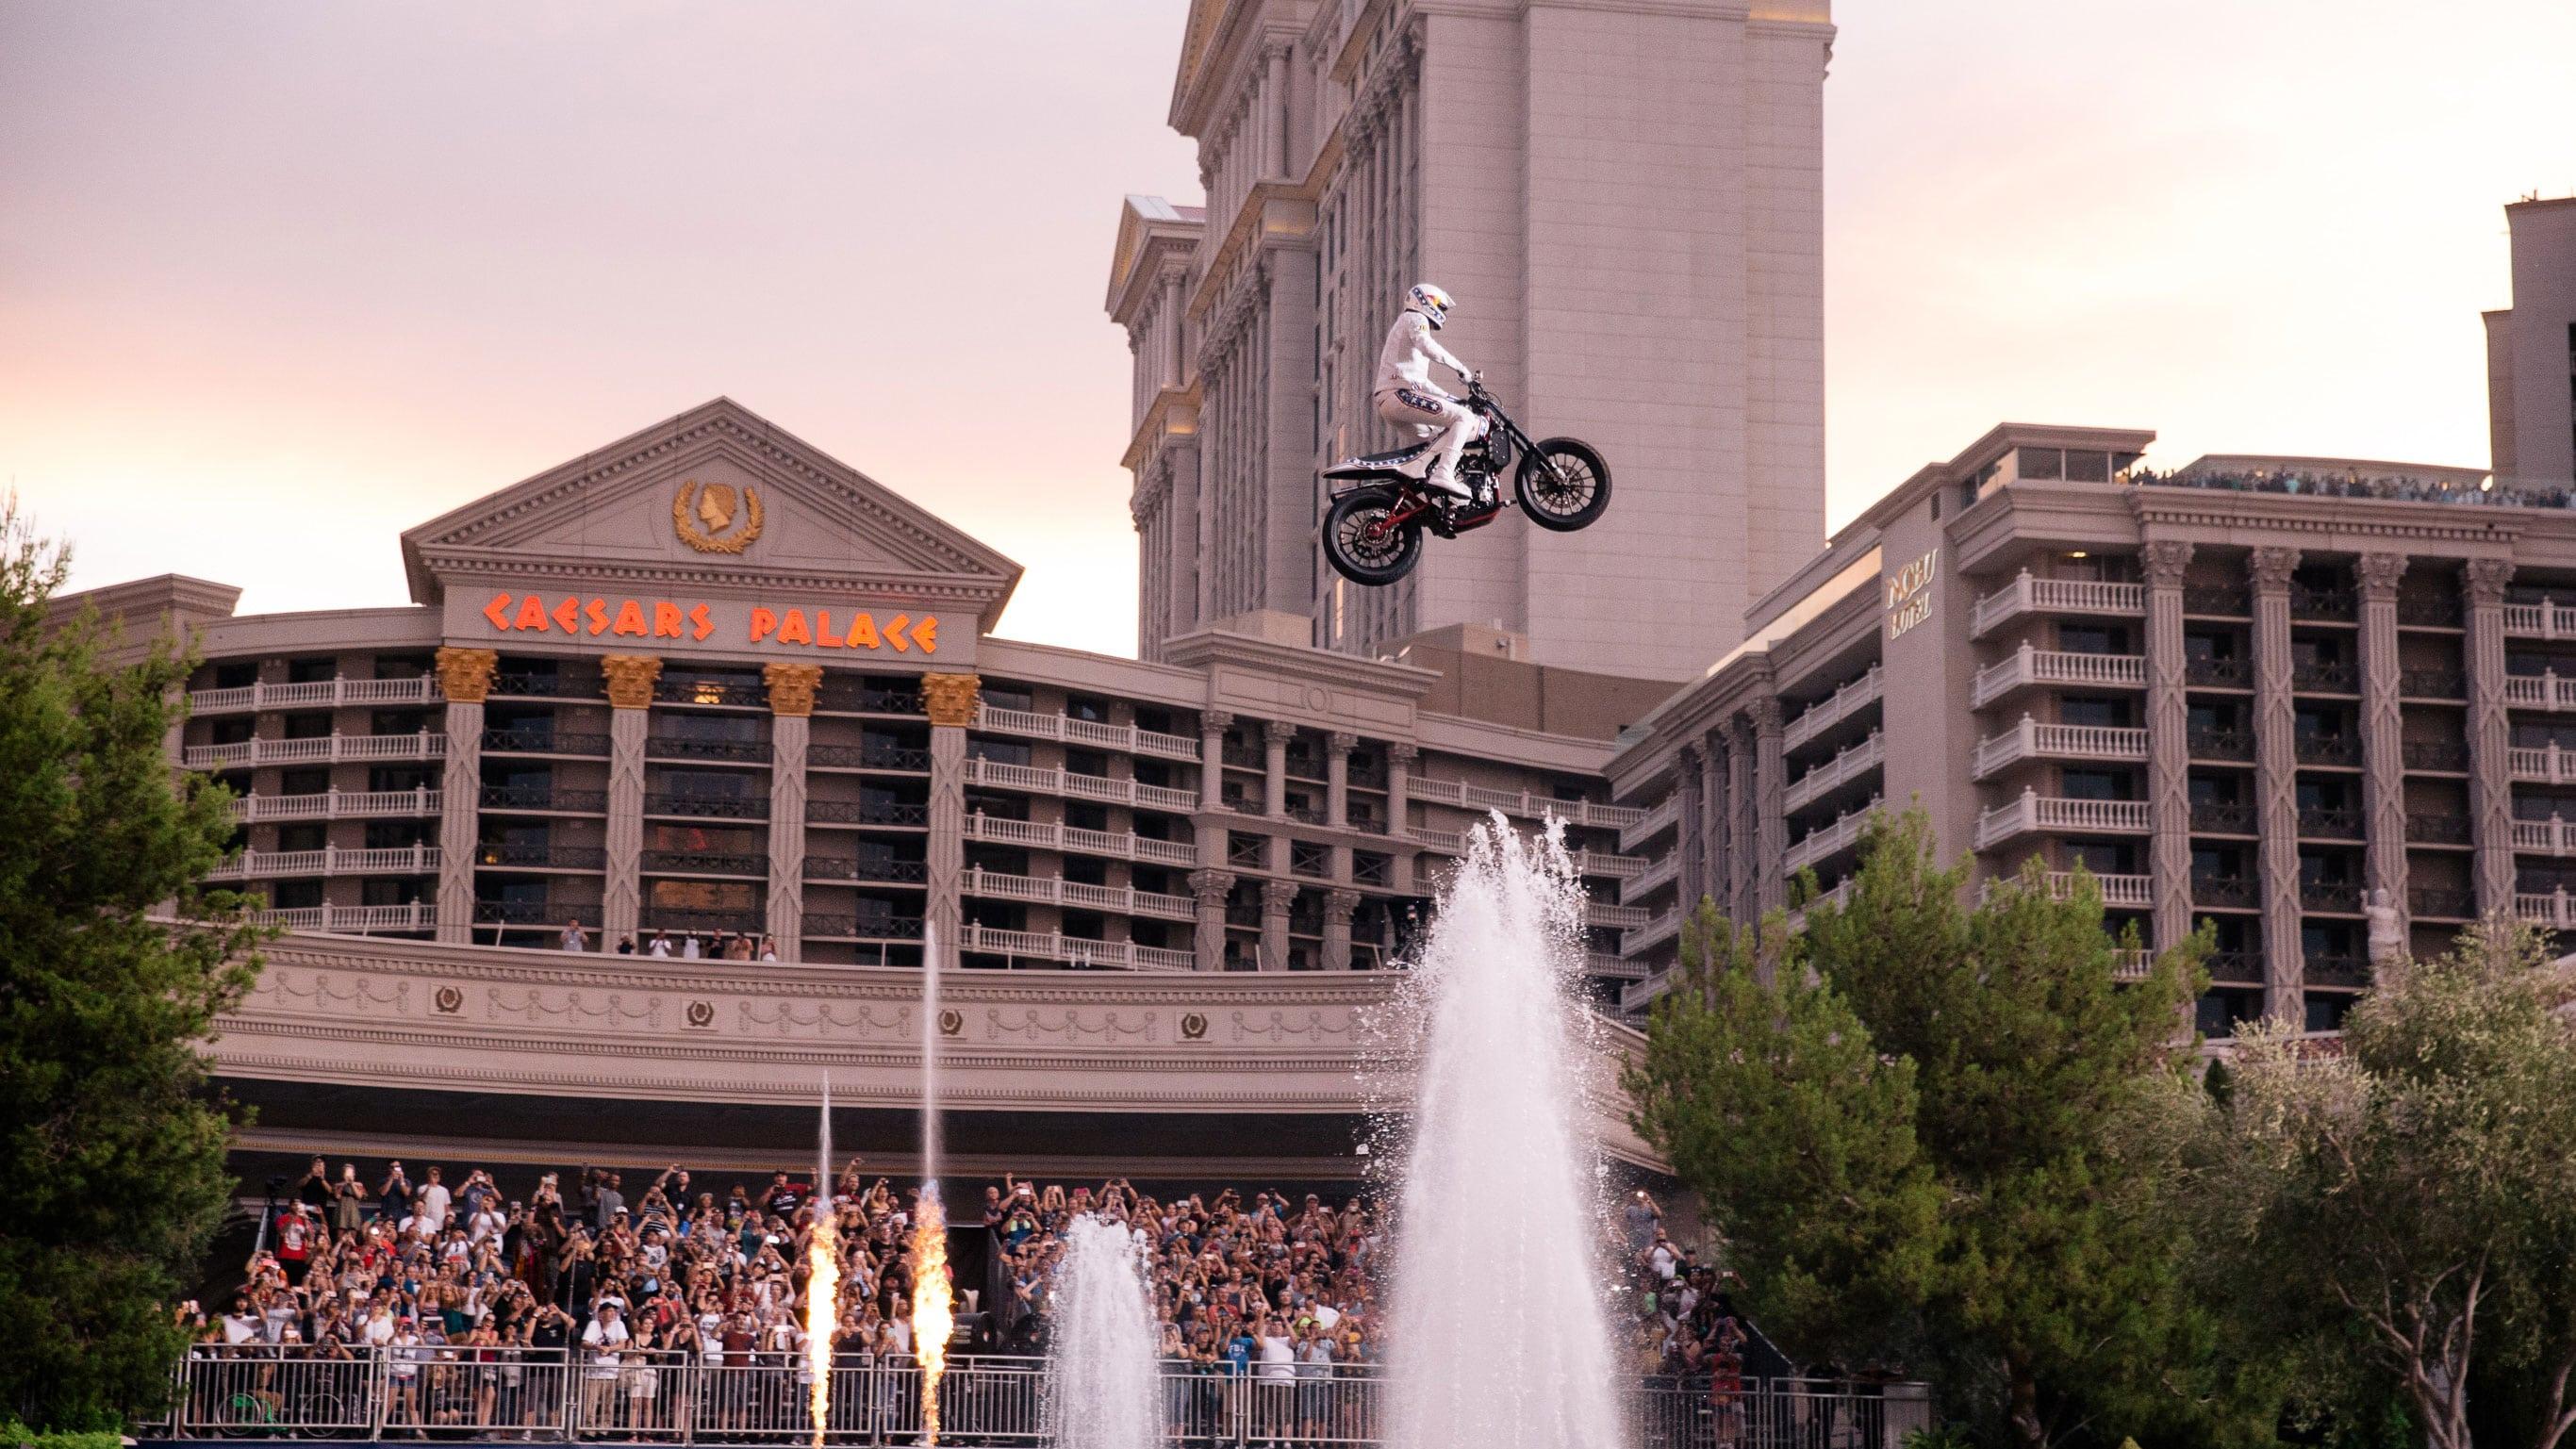 Travis Pastrana Las Vegas jumps